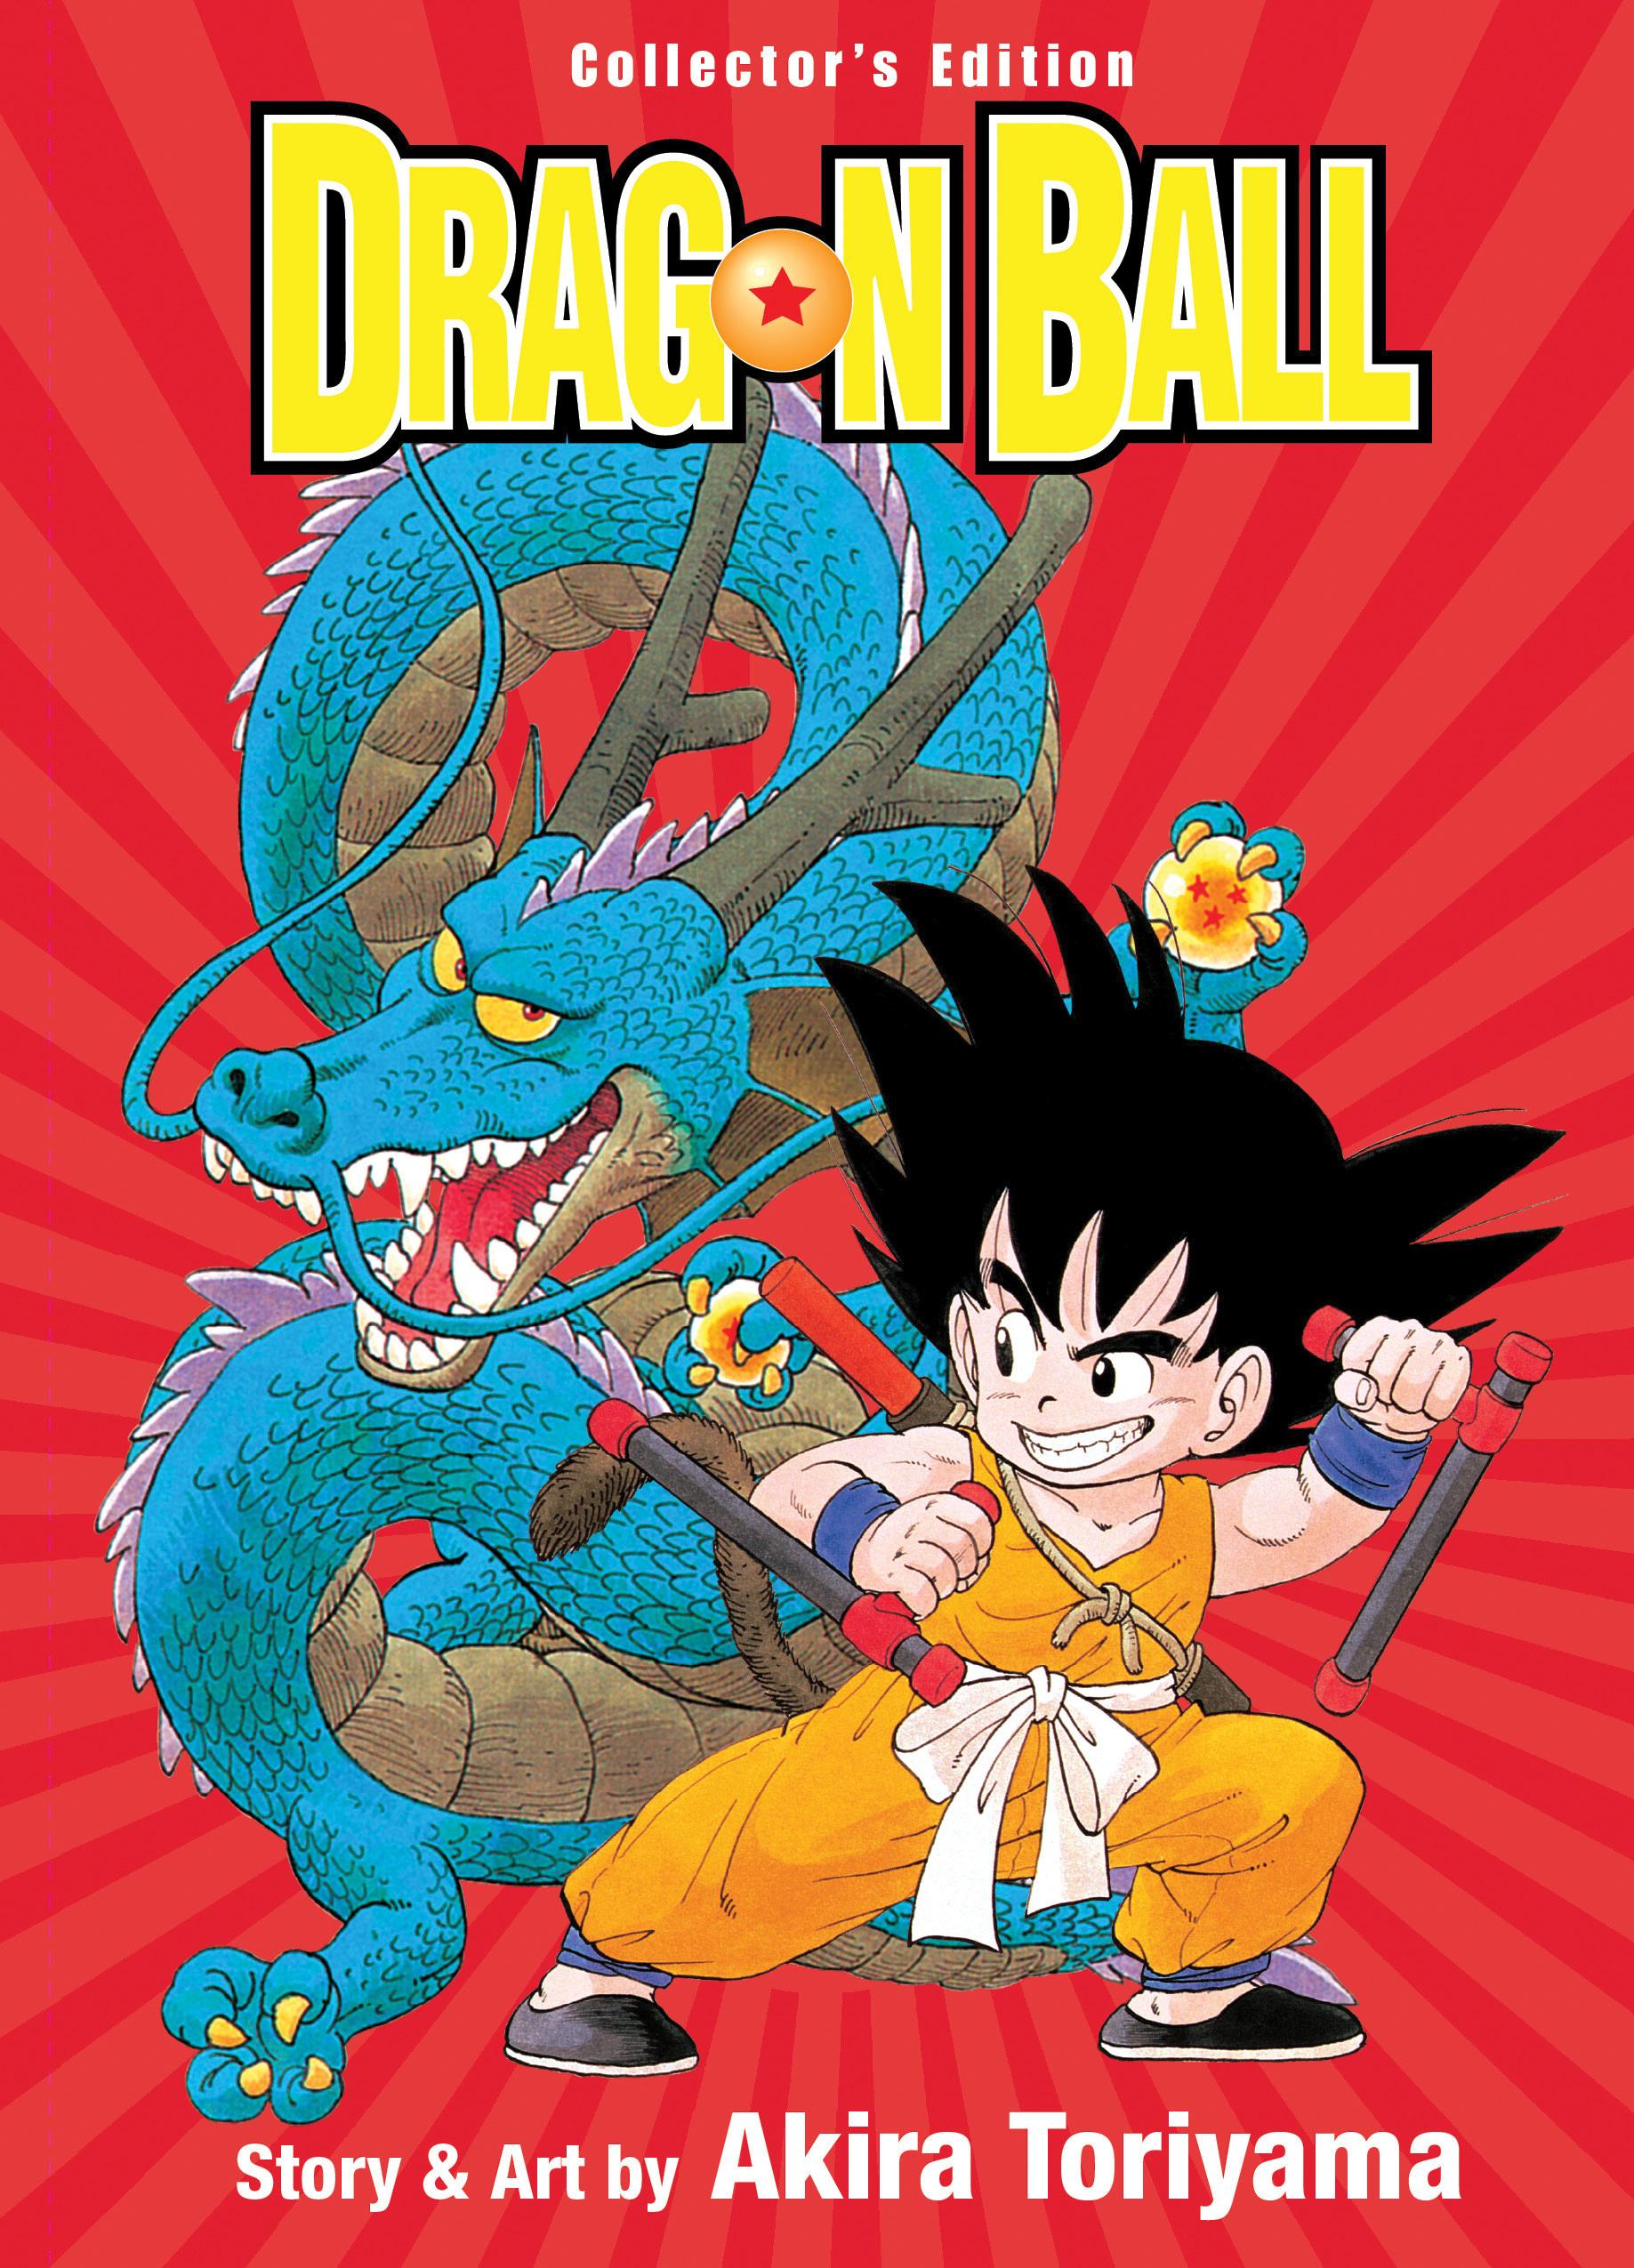 'Dragon Ball' Vol. 1